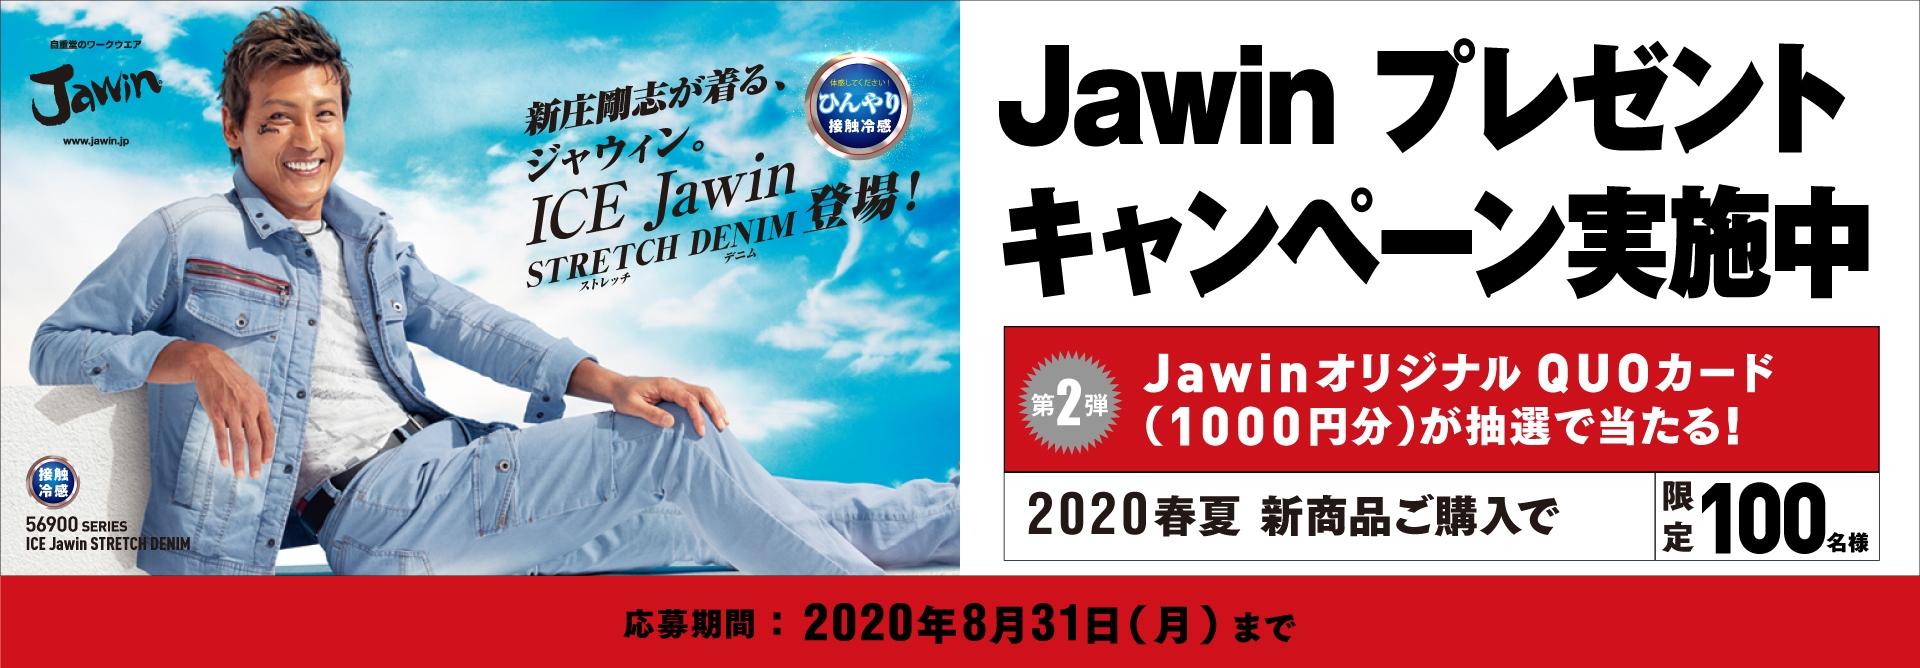 Jawin予約購入プレゼントキャンペーン